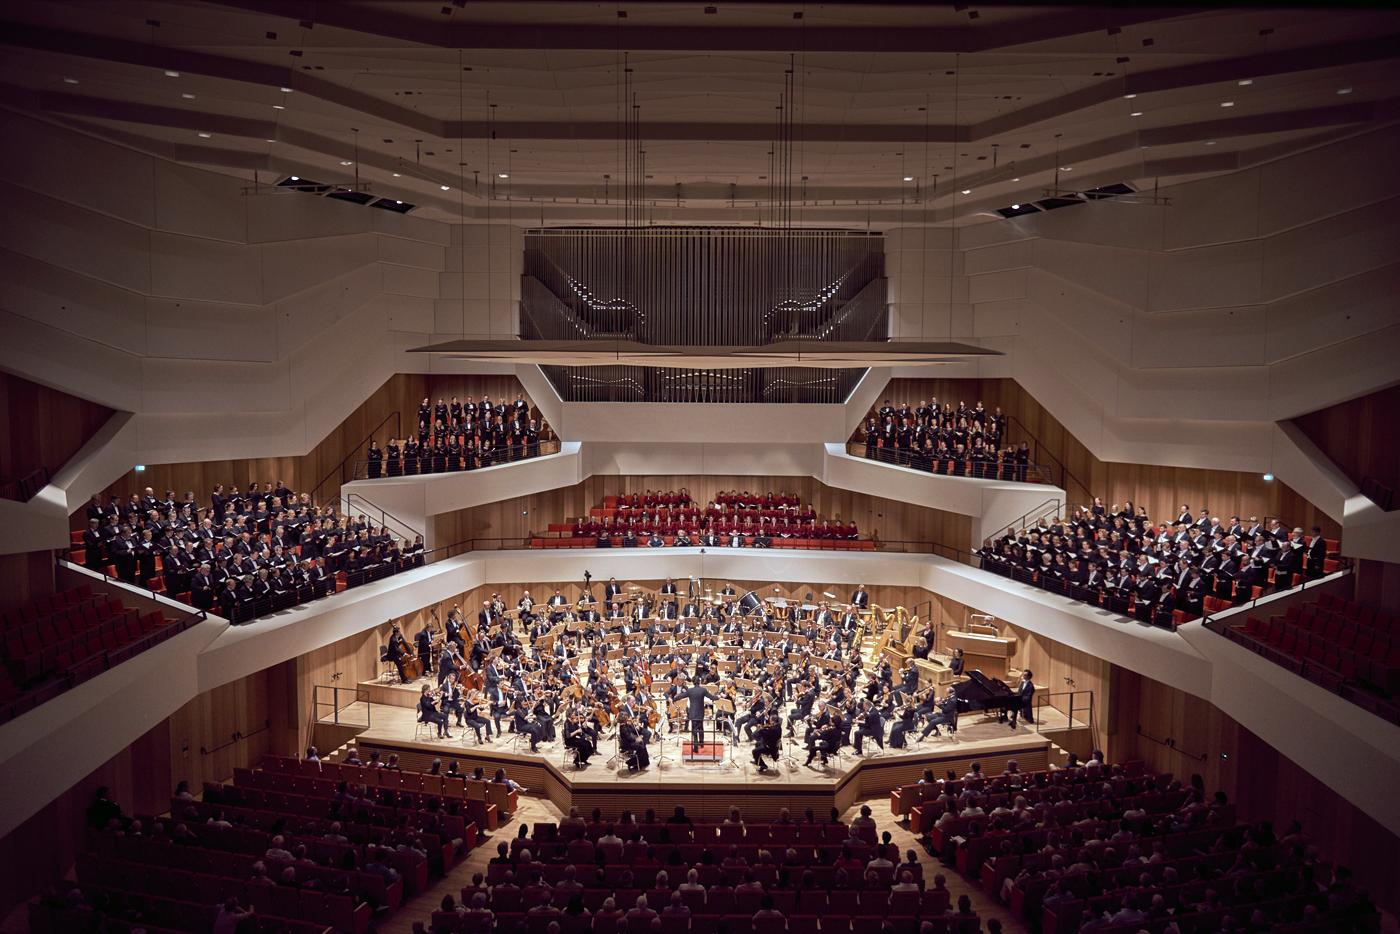 Musikfestspiele Dresden